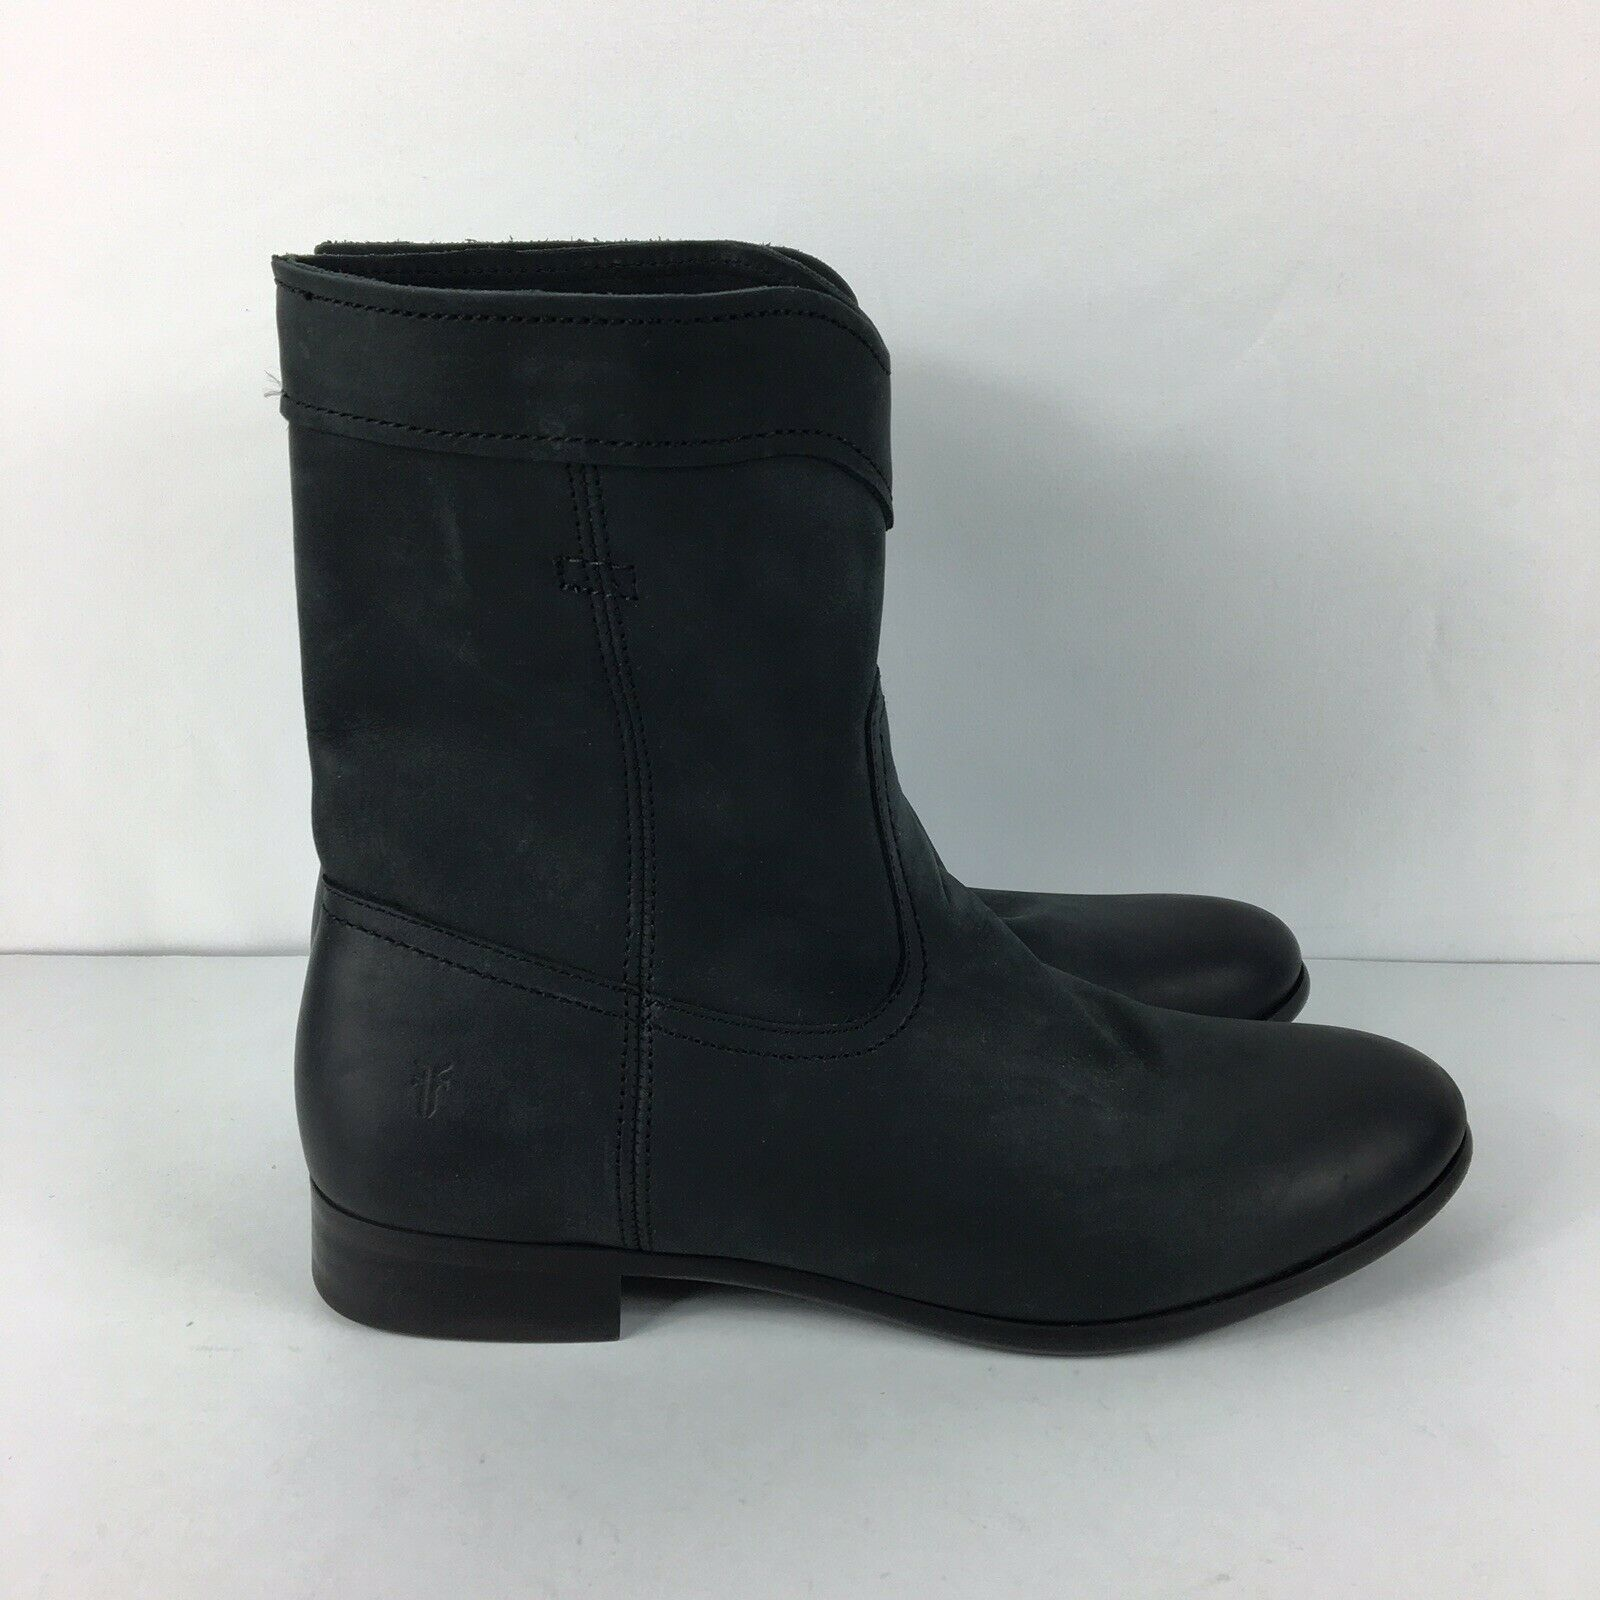 Frye Cara Roper Short Riding Boots Womens Leather Cowboy Round Toe Black Sz 8.5